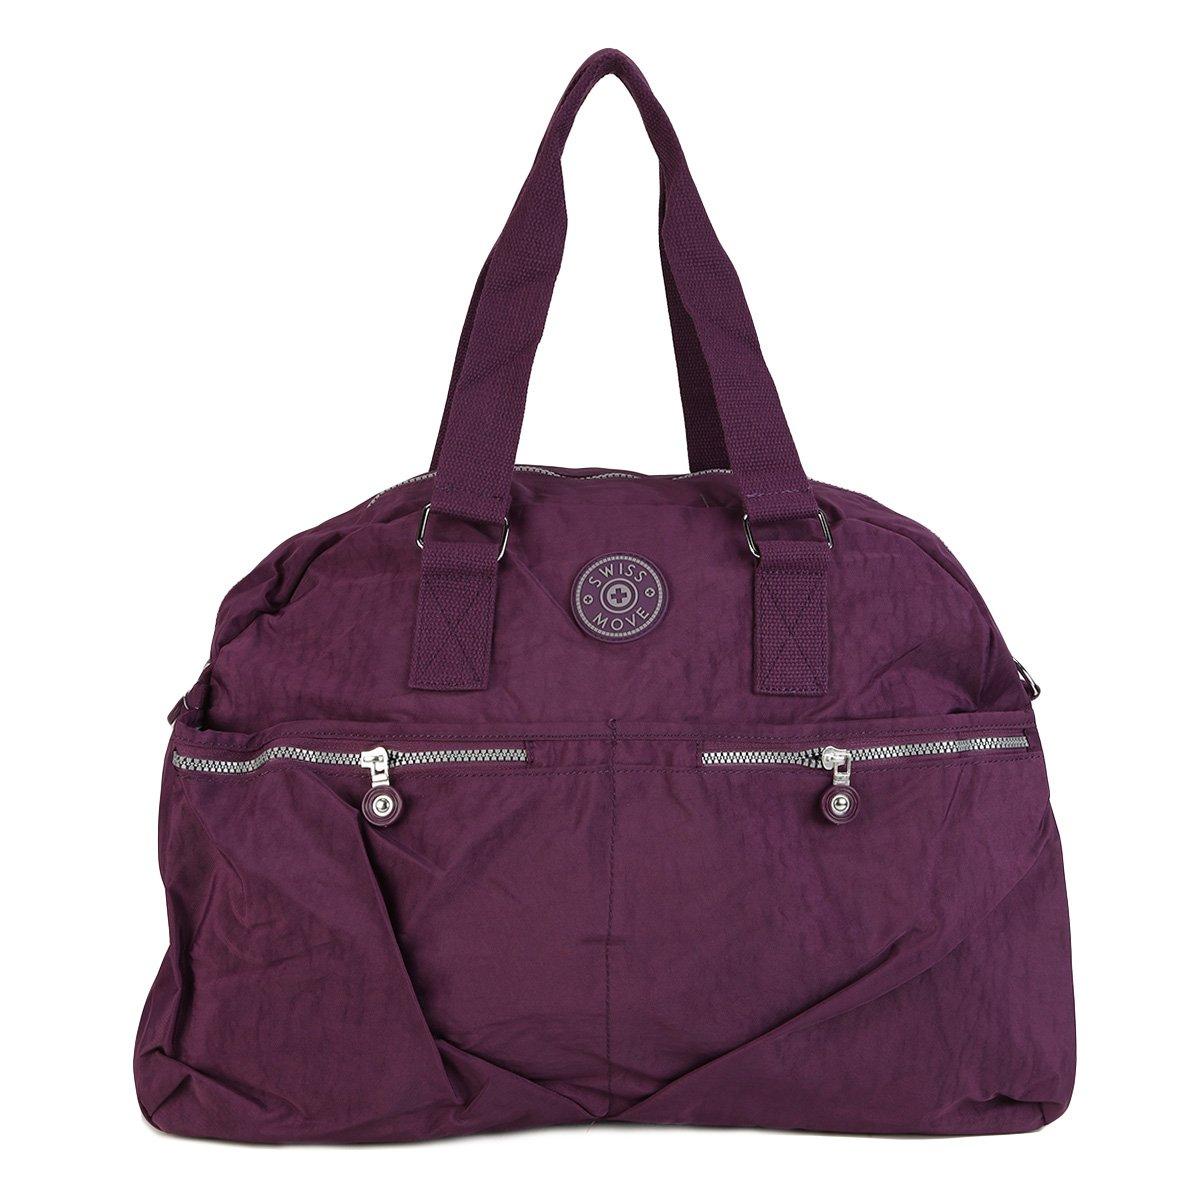 Bolsa Swiss Shopper Move Bolsa It s Crinkle US Feminina - Compre Agora  740ef9b314e9a